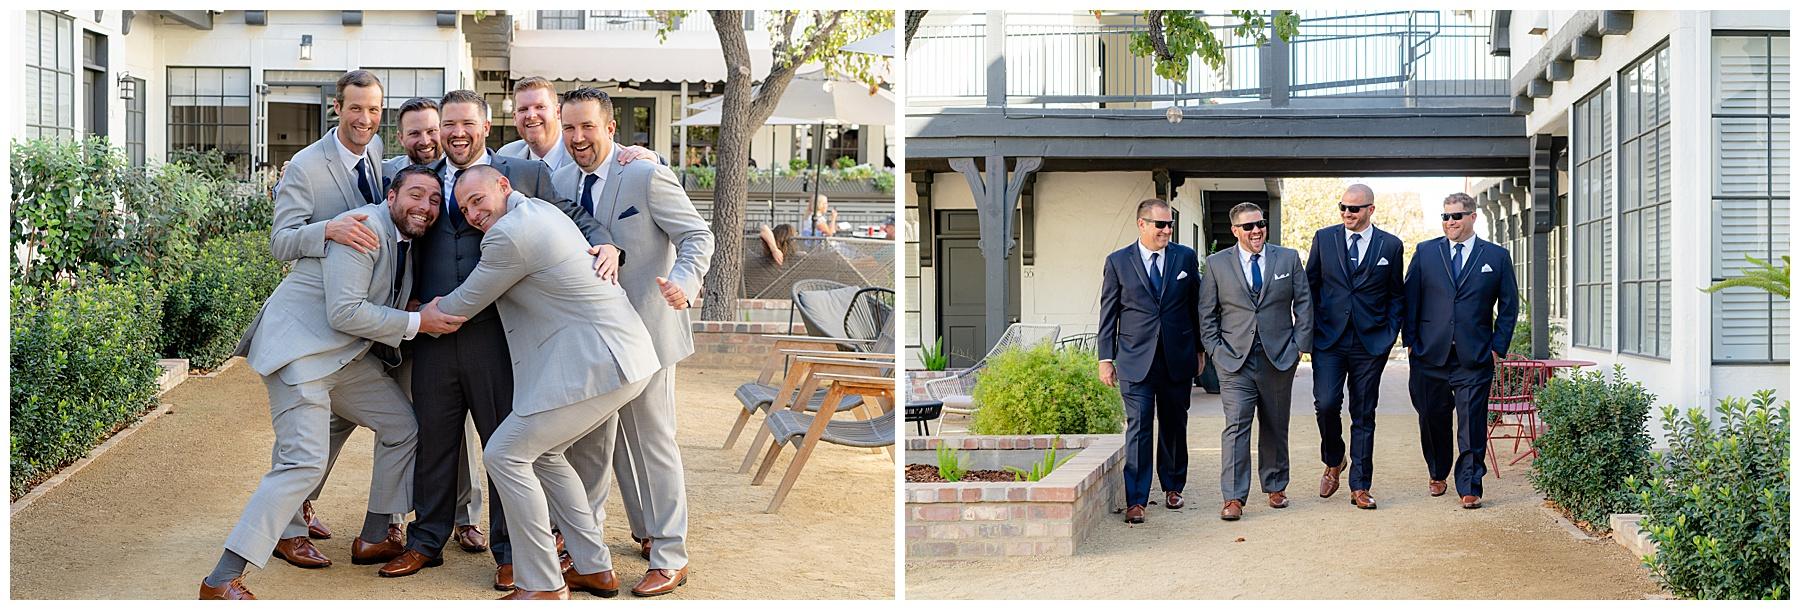 the landsby wedding